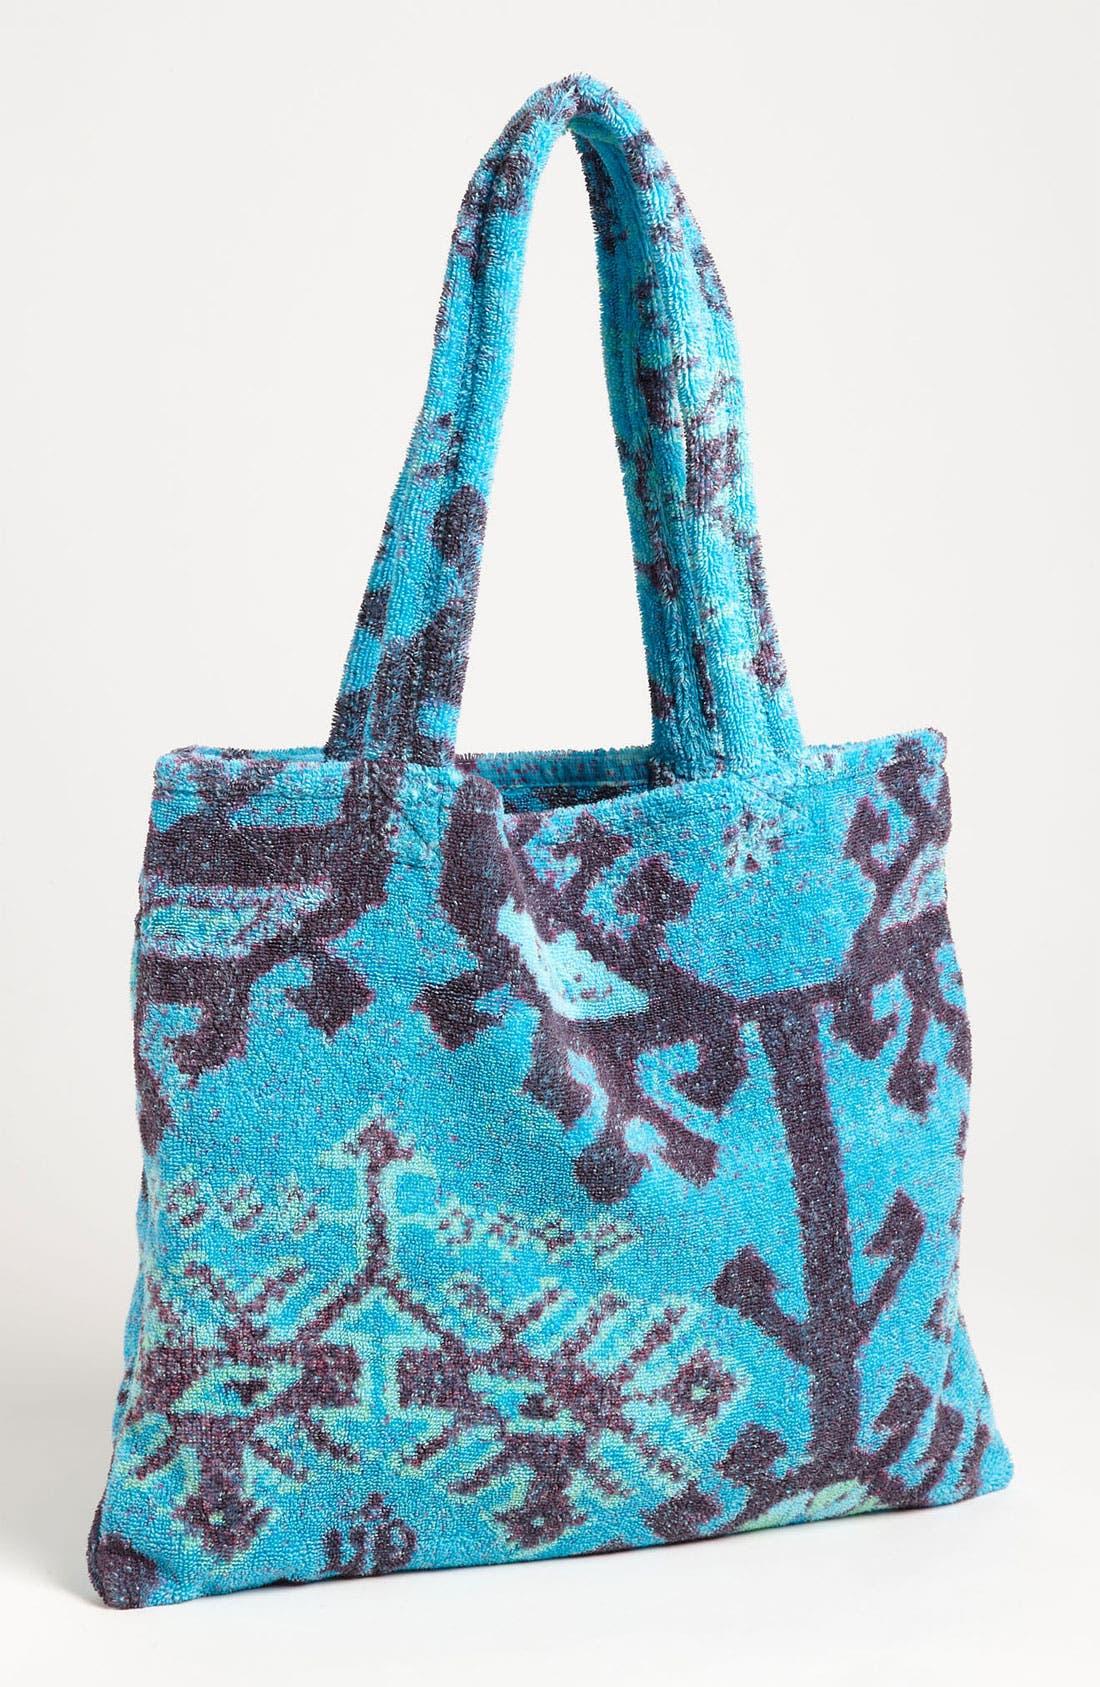 Main Image - Fresco Towels 'Small' Terry Tote Bag